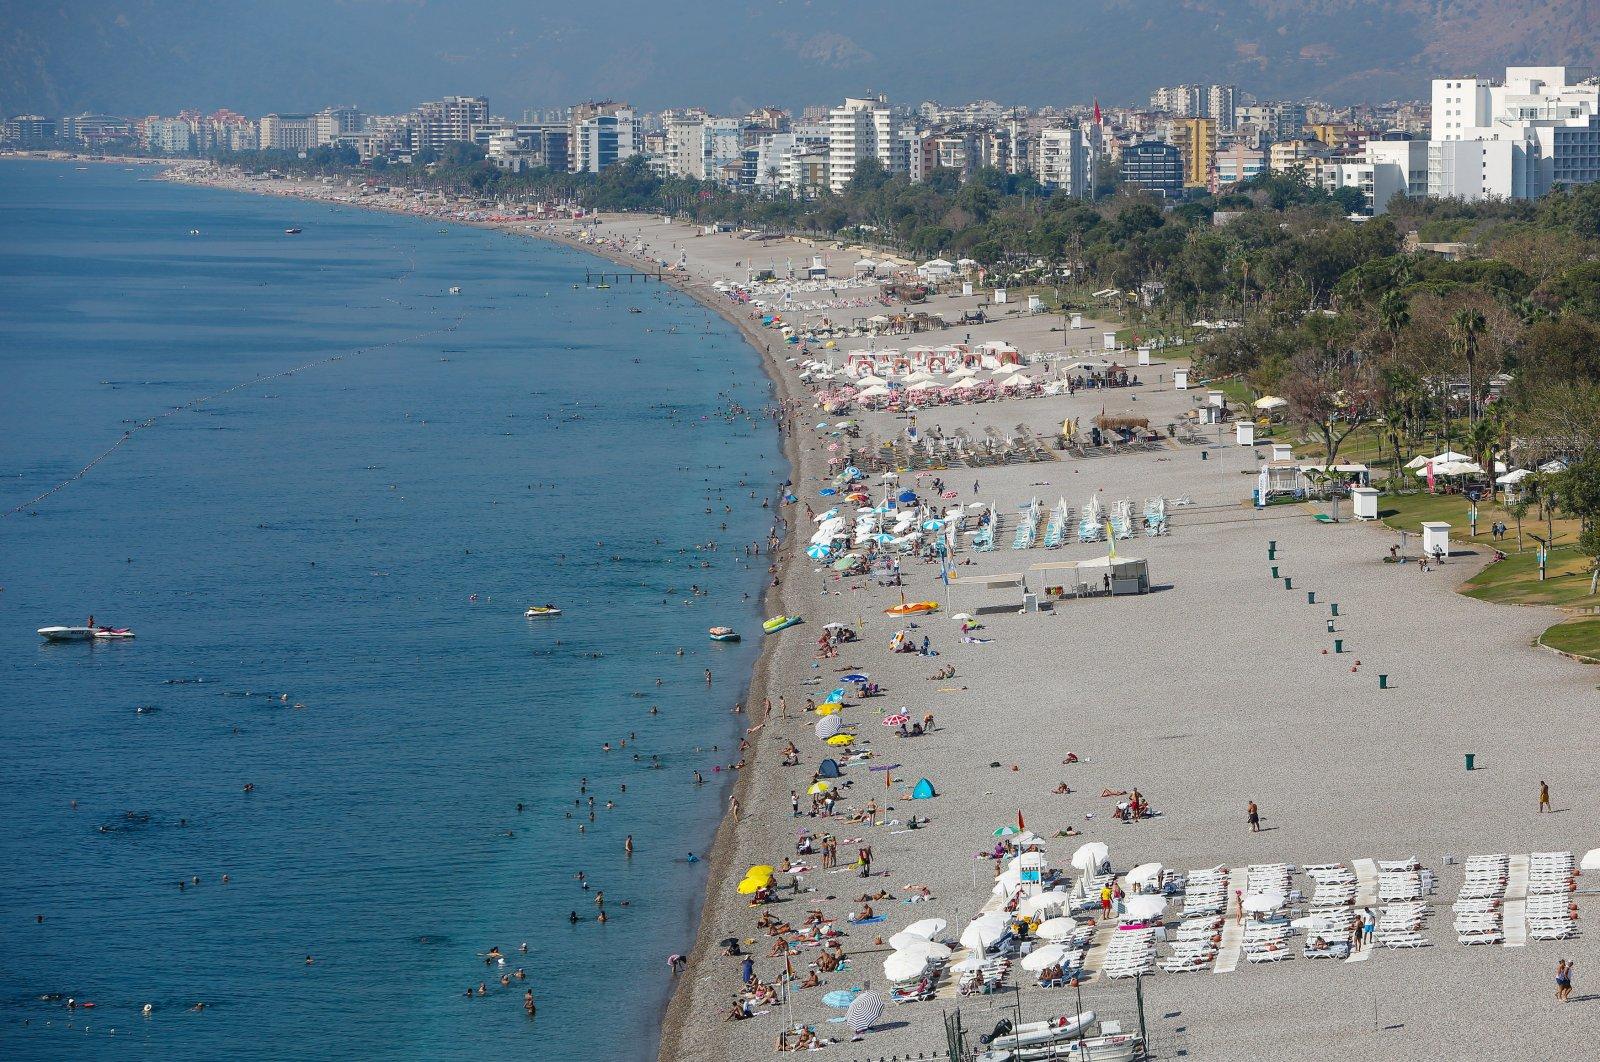 People enjoy the sunny weather at the Konyaaltı Beach in Antalya, southern Turkey, Sept. 10, 2019. (DHA Photo)